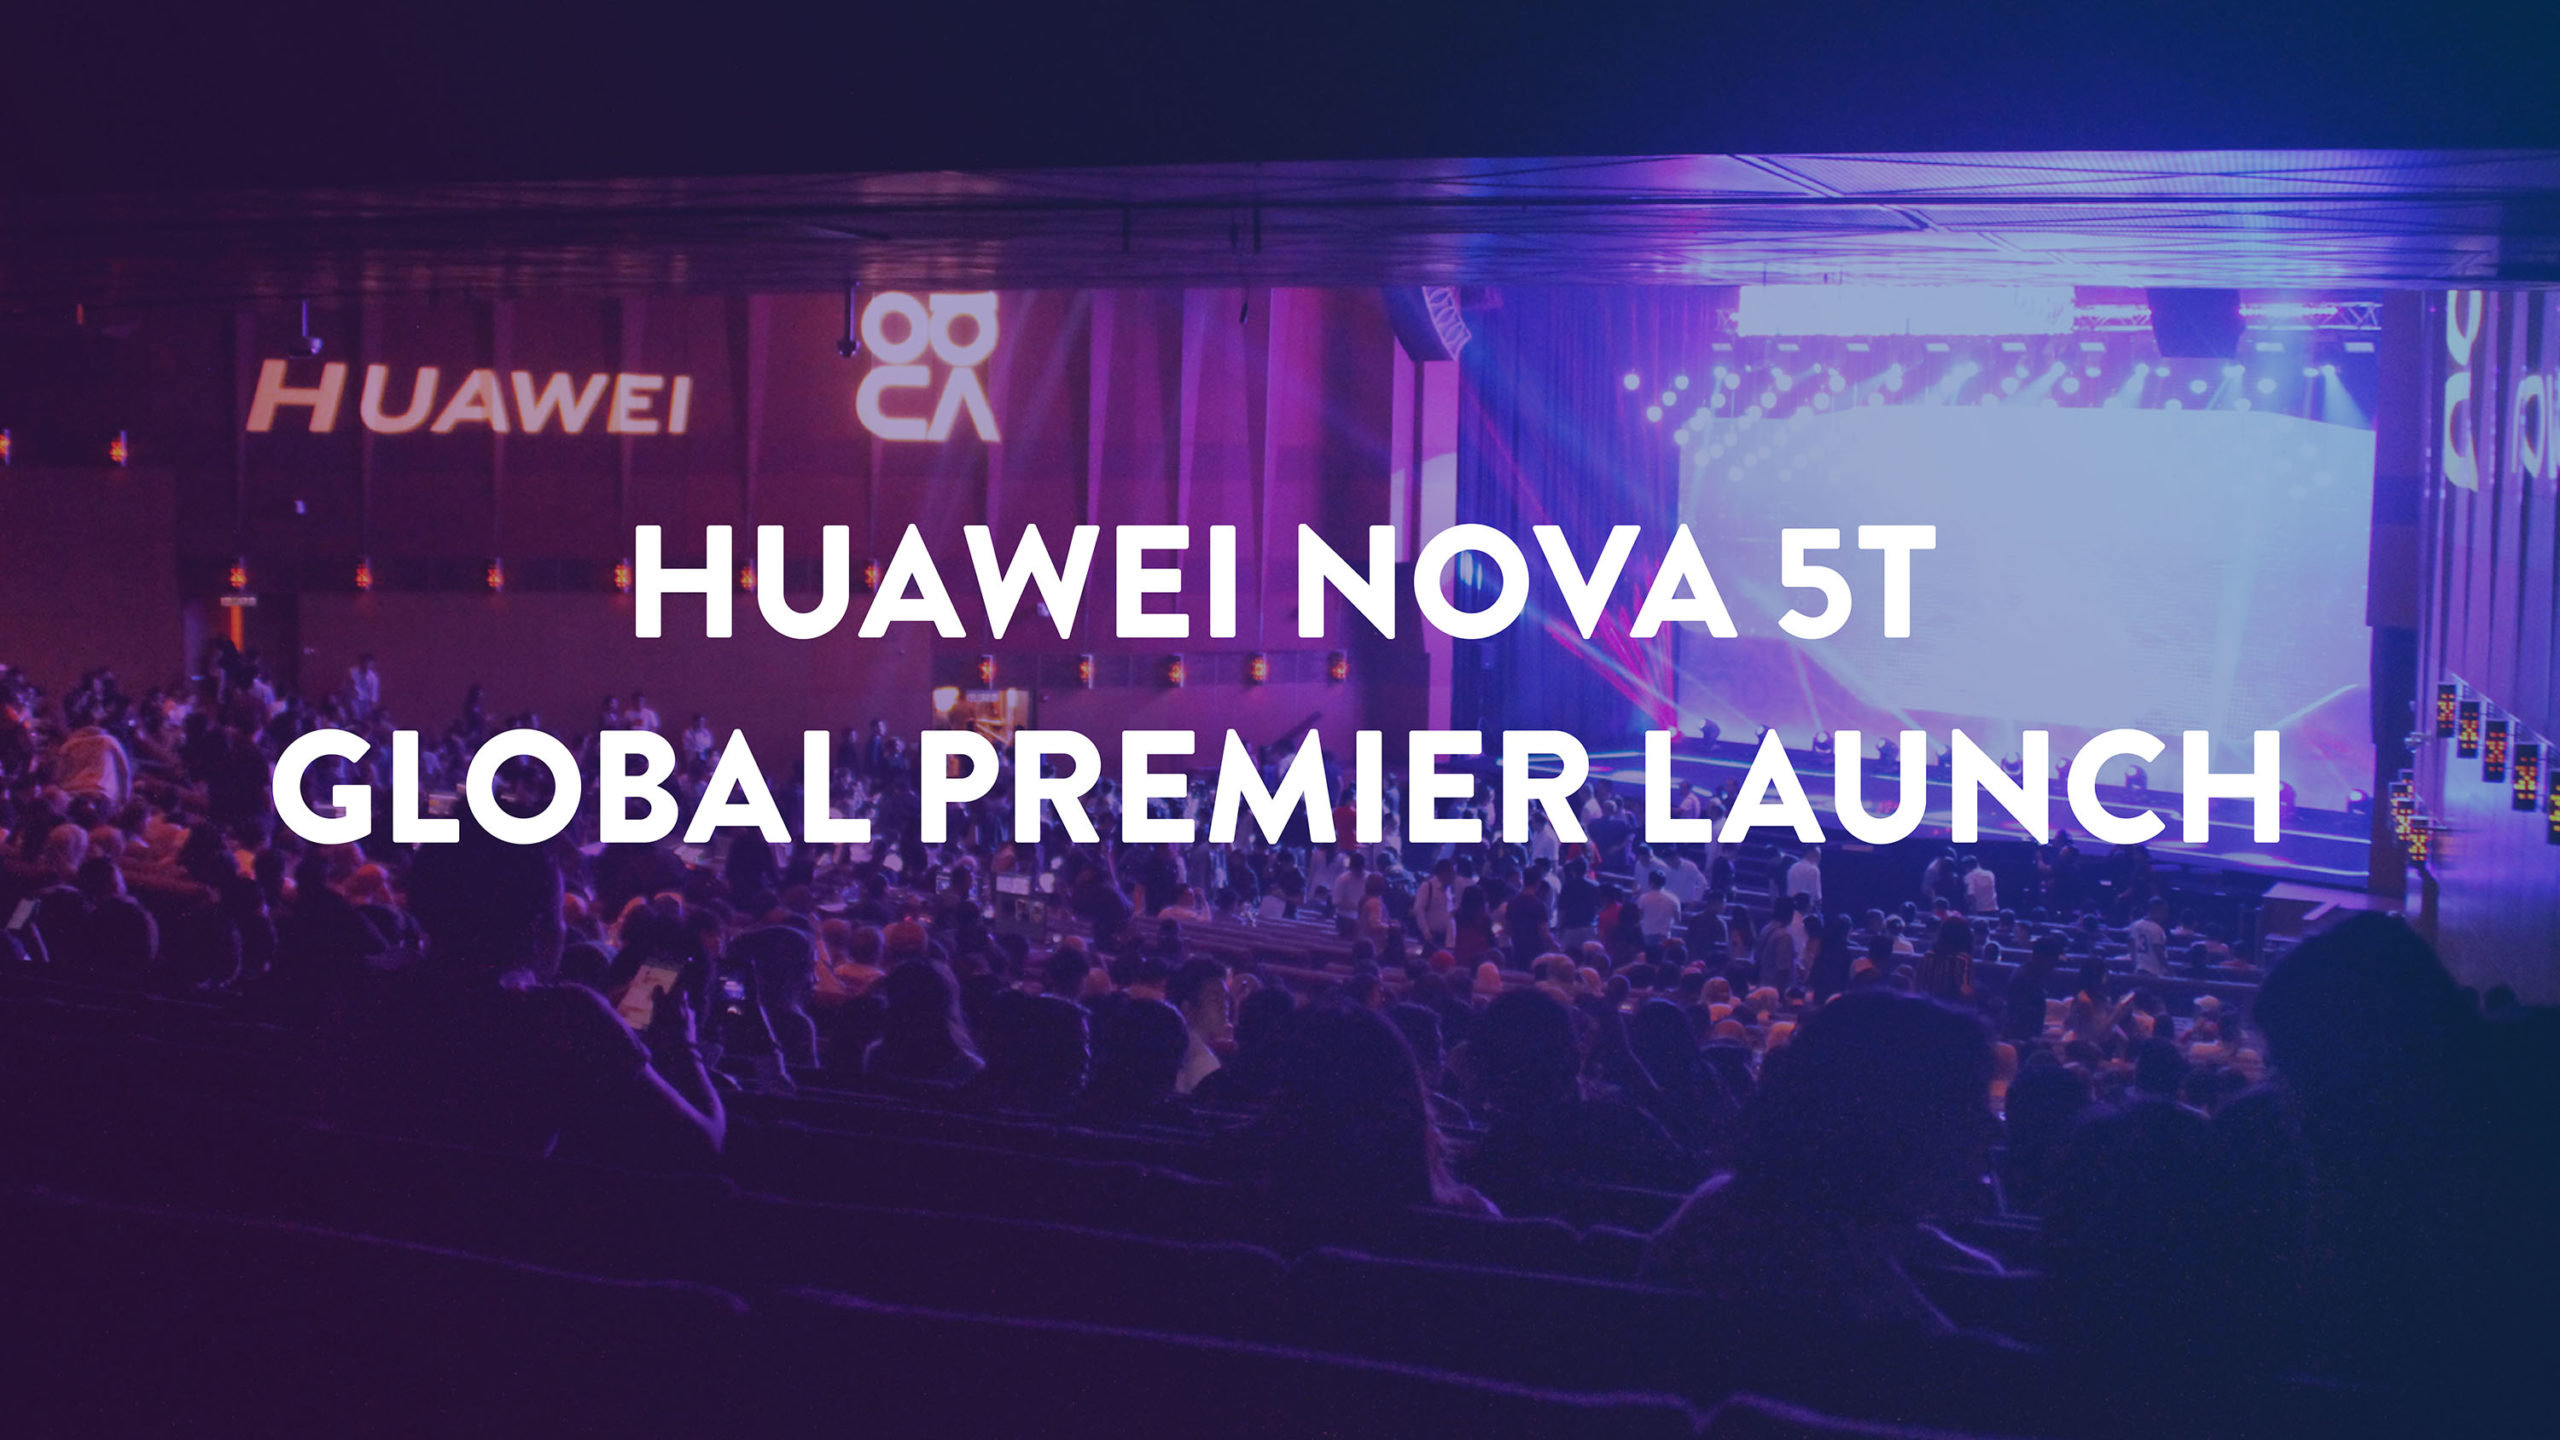 Huawei Nova 5t Global Premier Launch